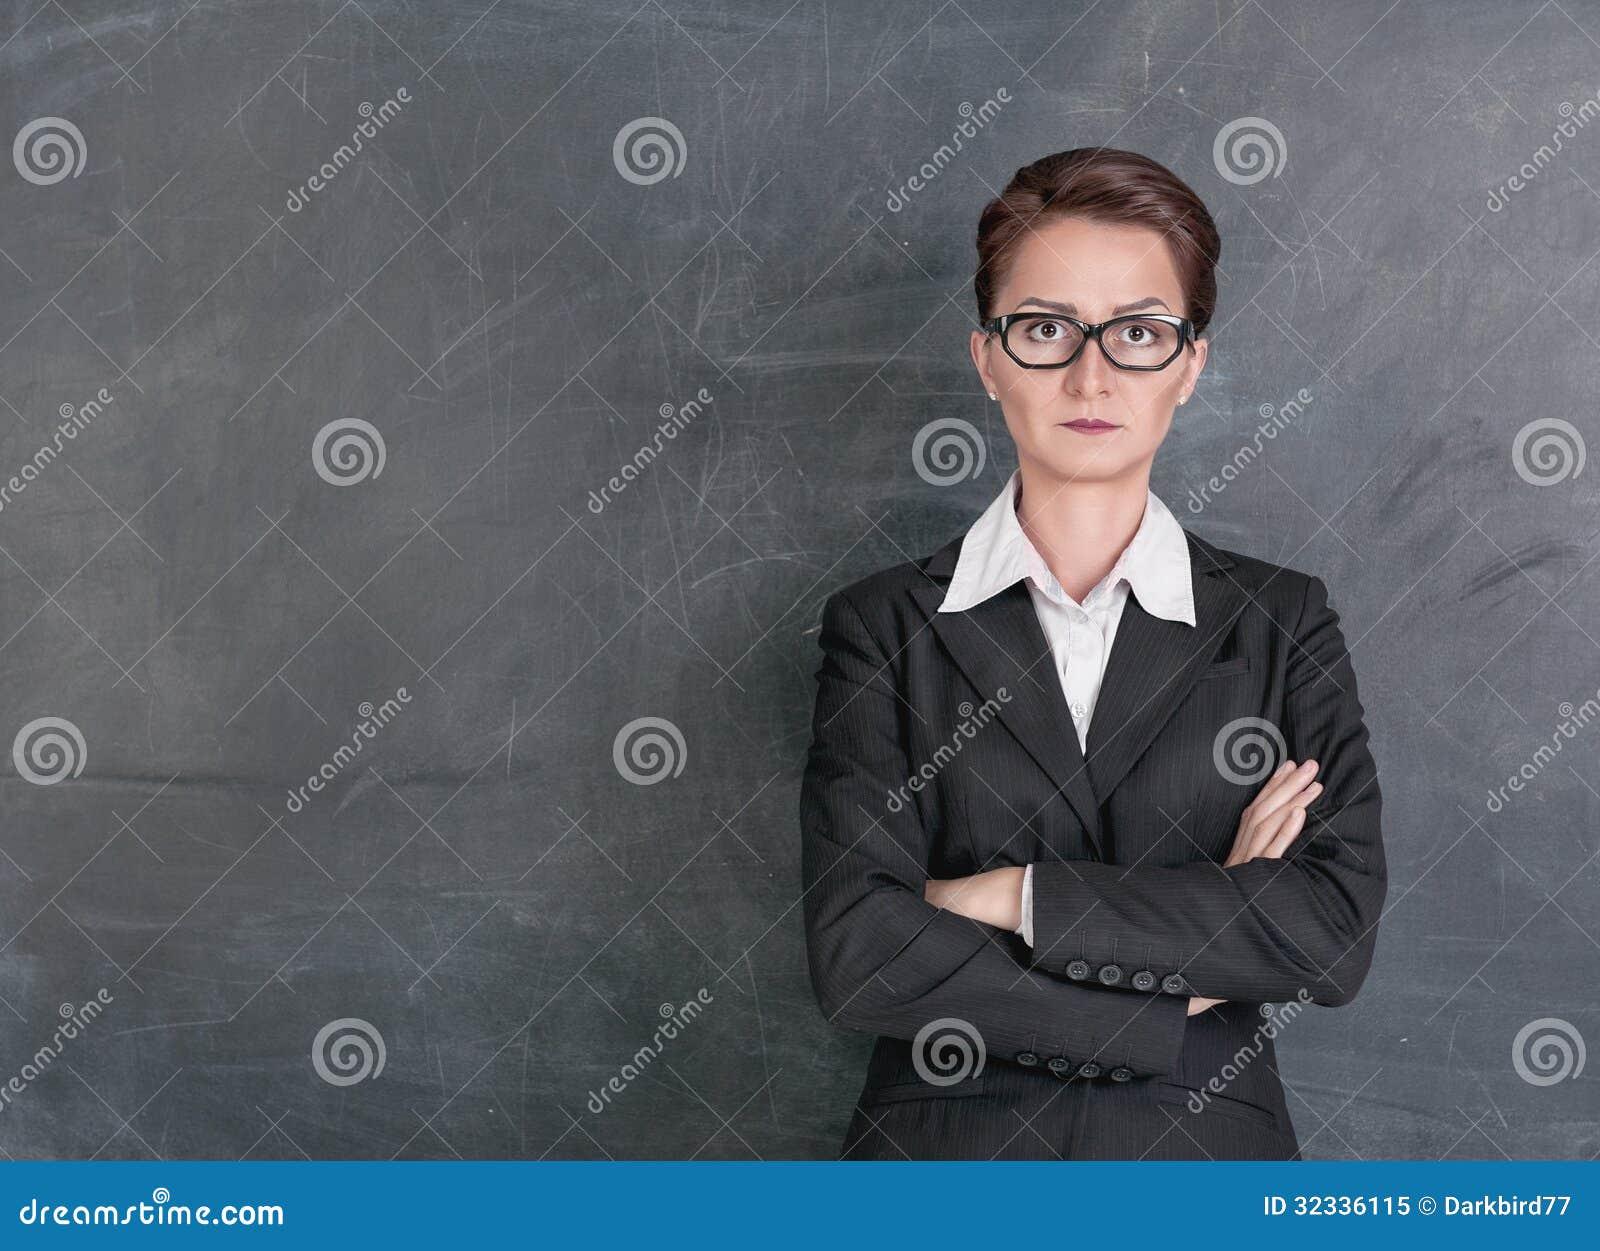 Profesor estricto